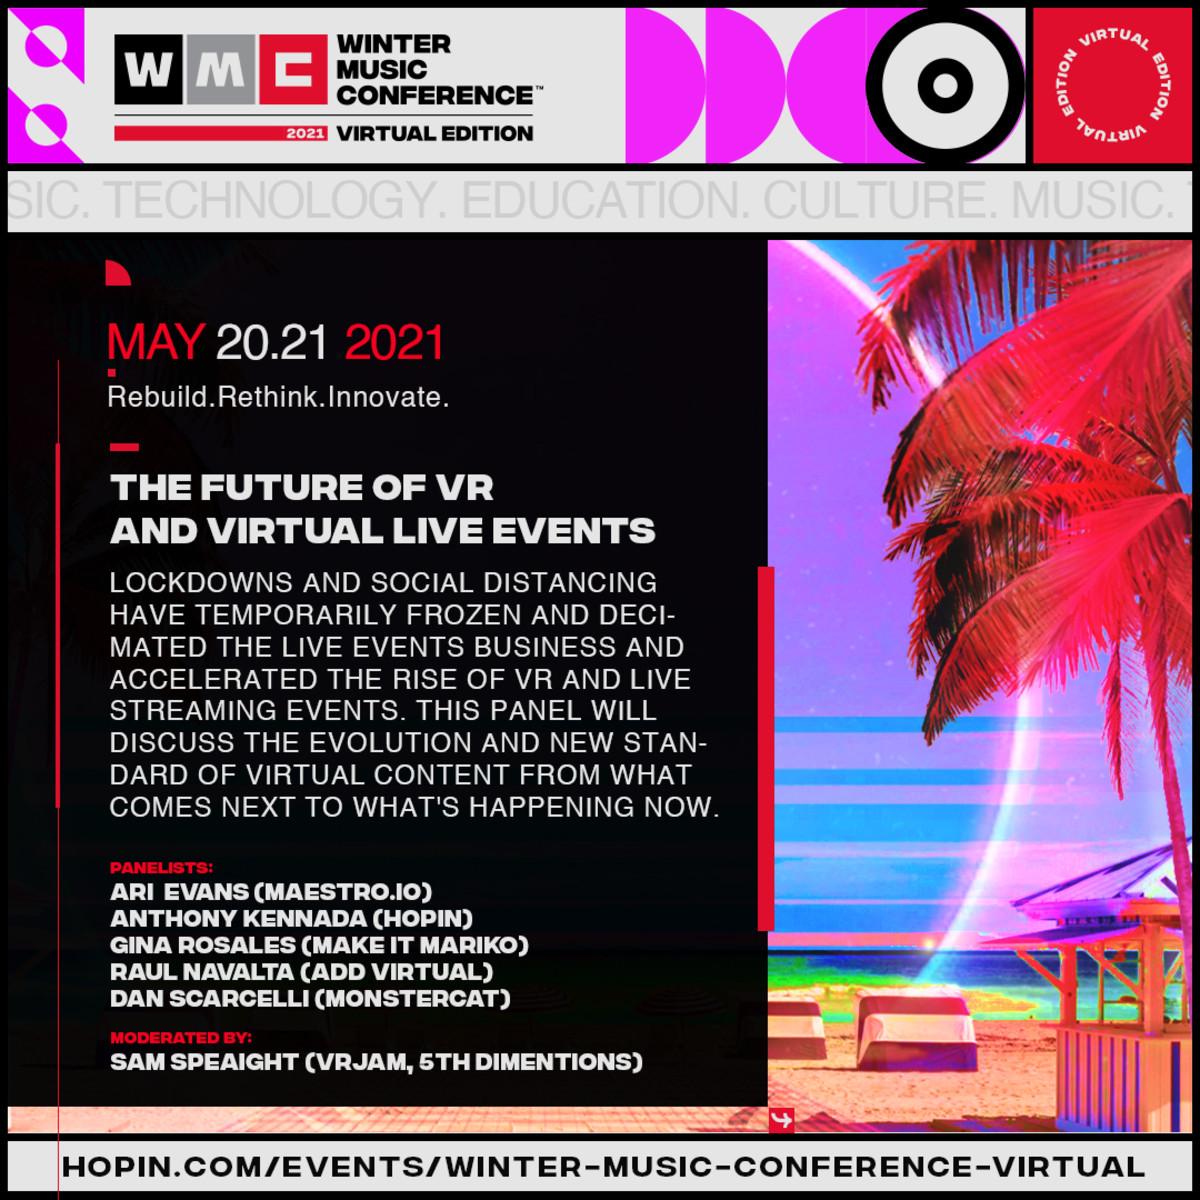 The Panel Description - Future of VR and Virtual Live Events